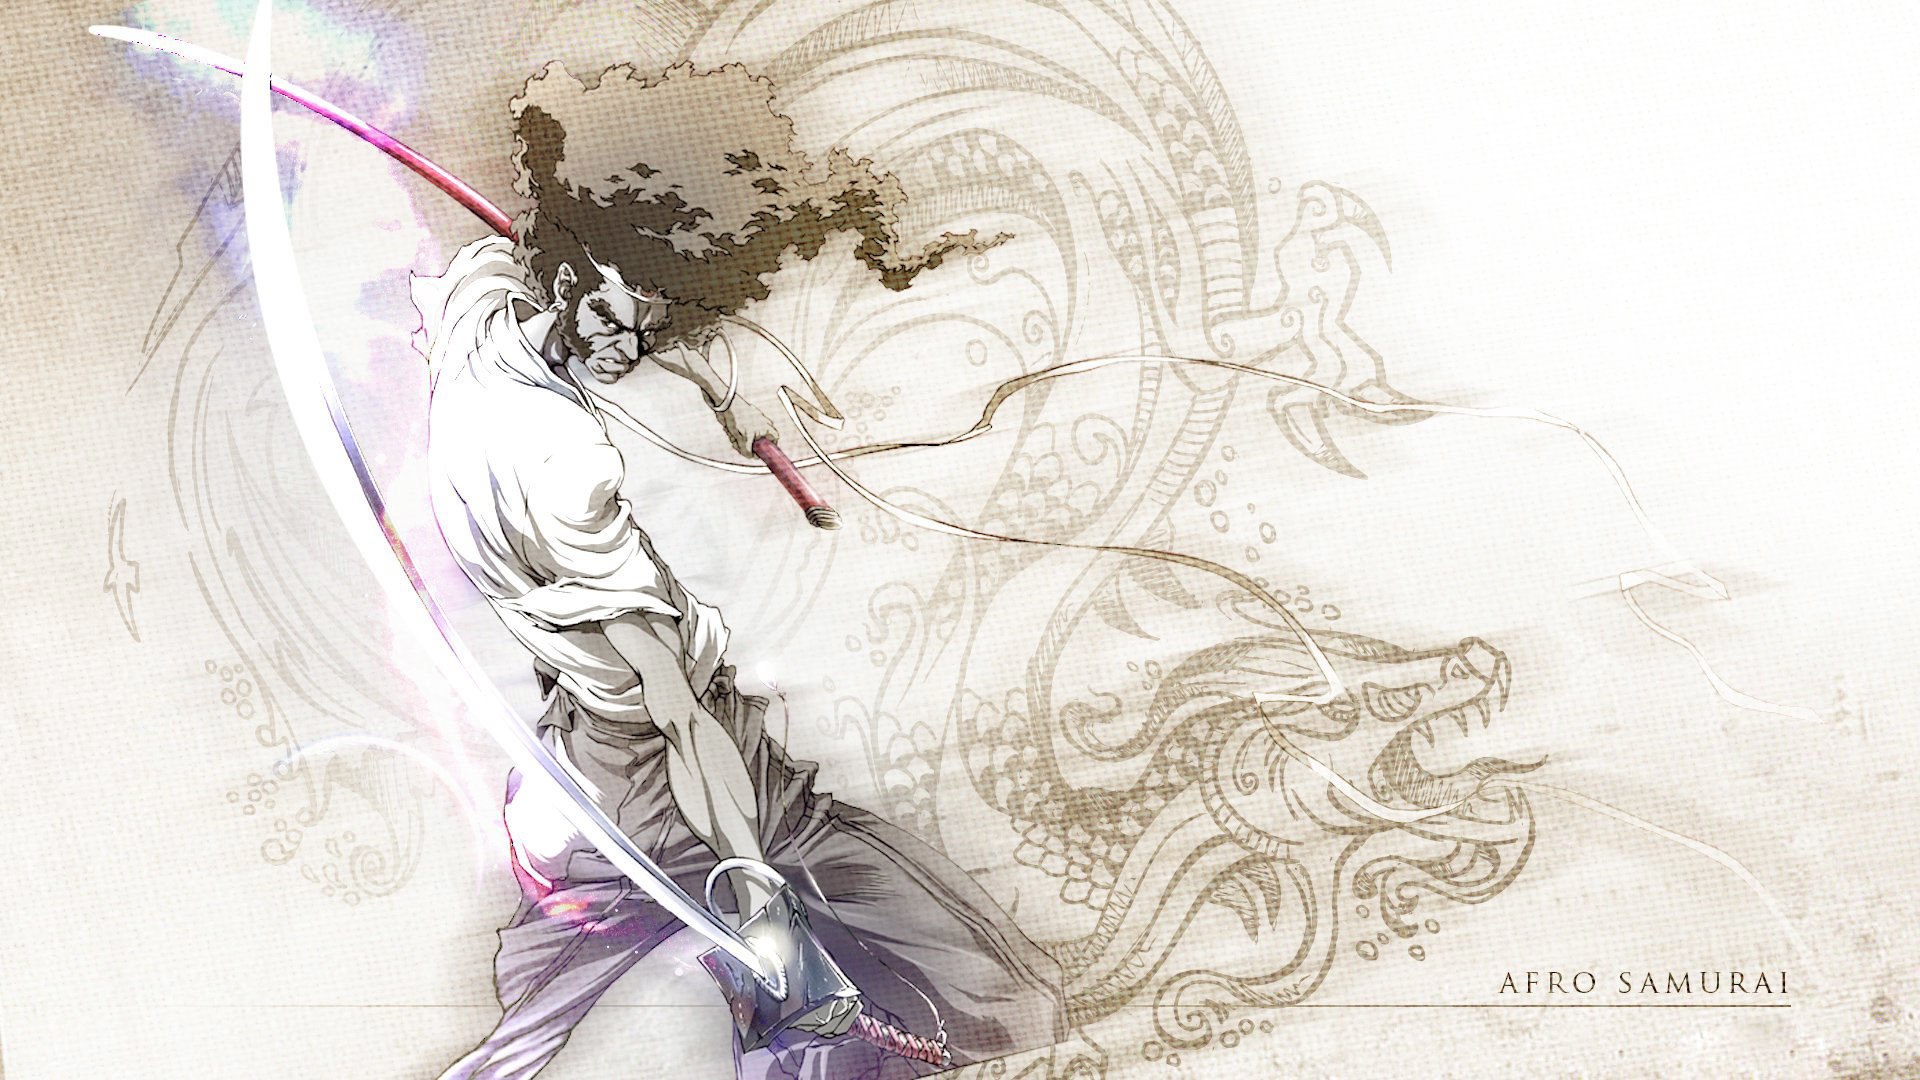 Afro Samurai Wallpaper Hd 75 Images